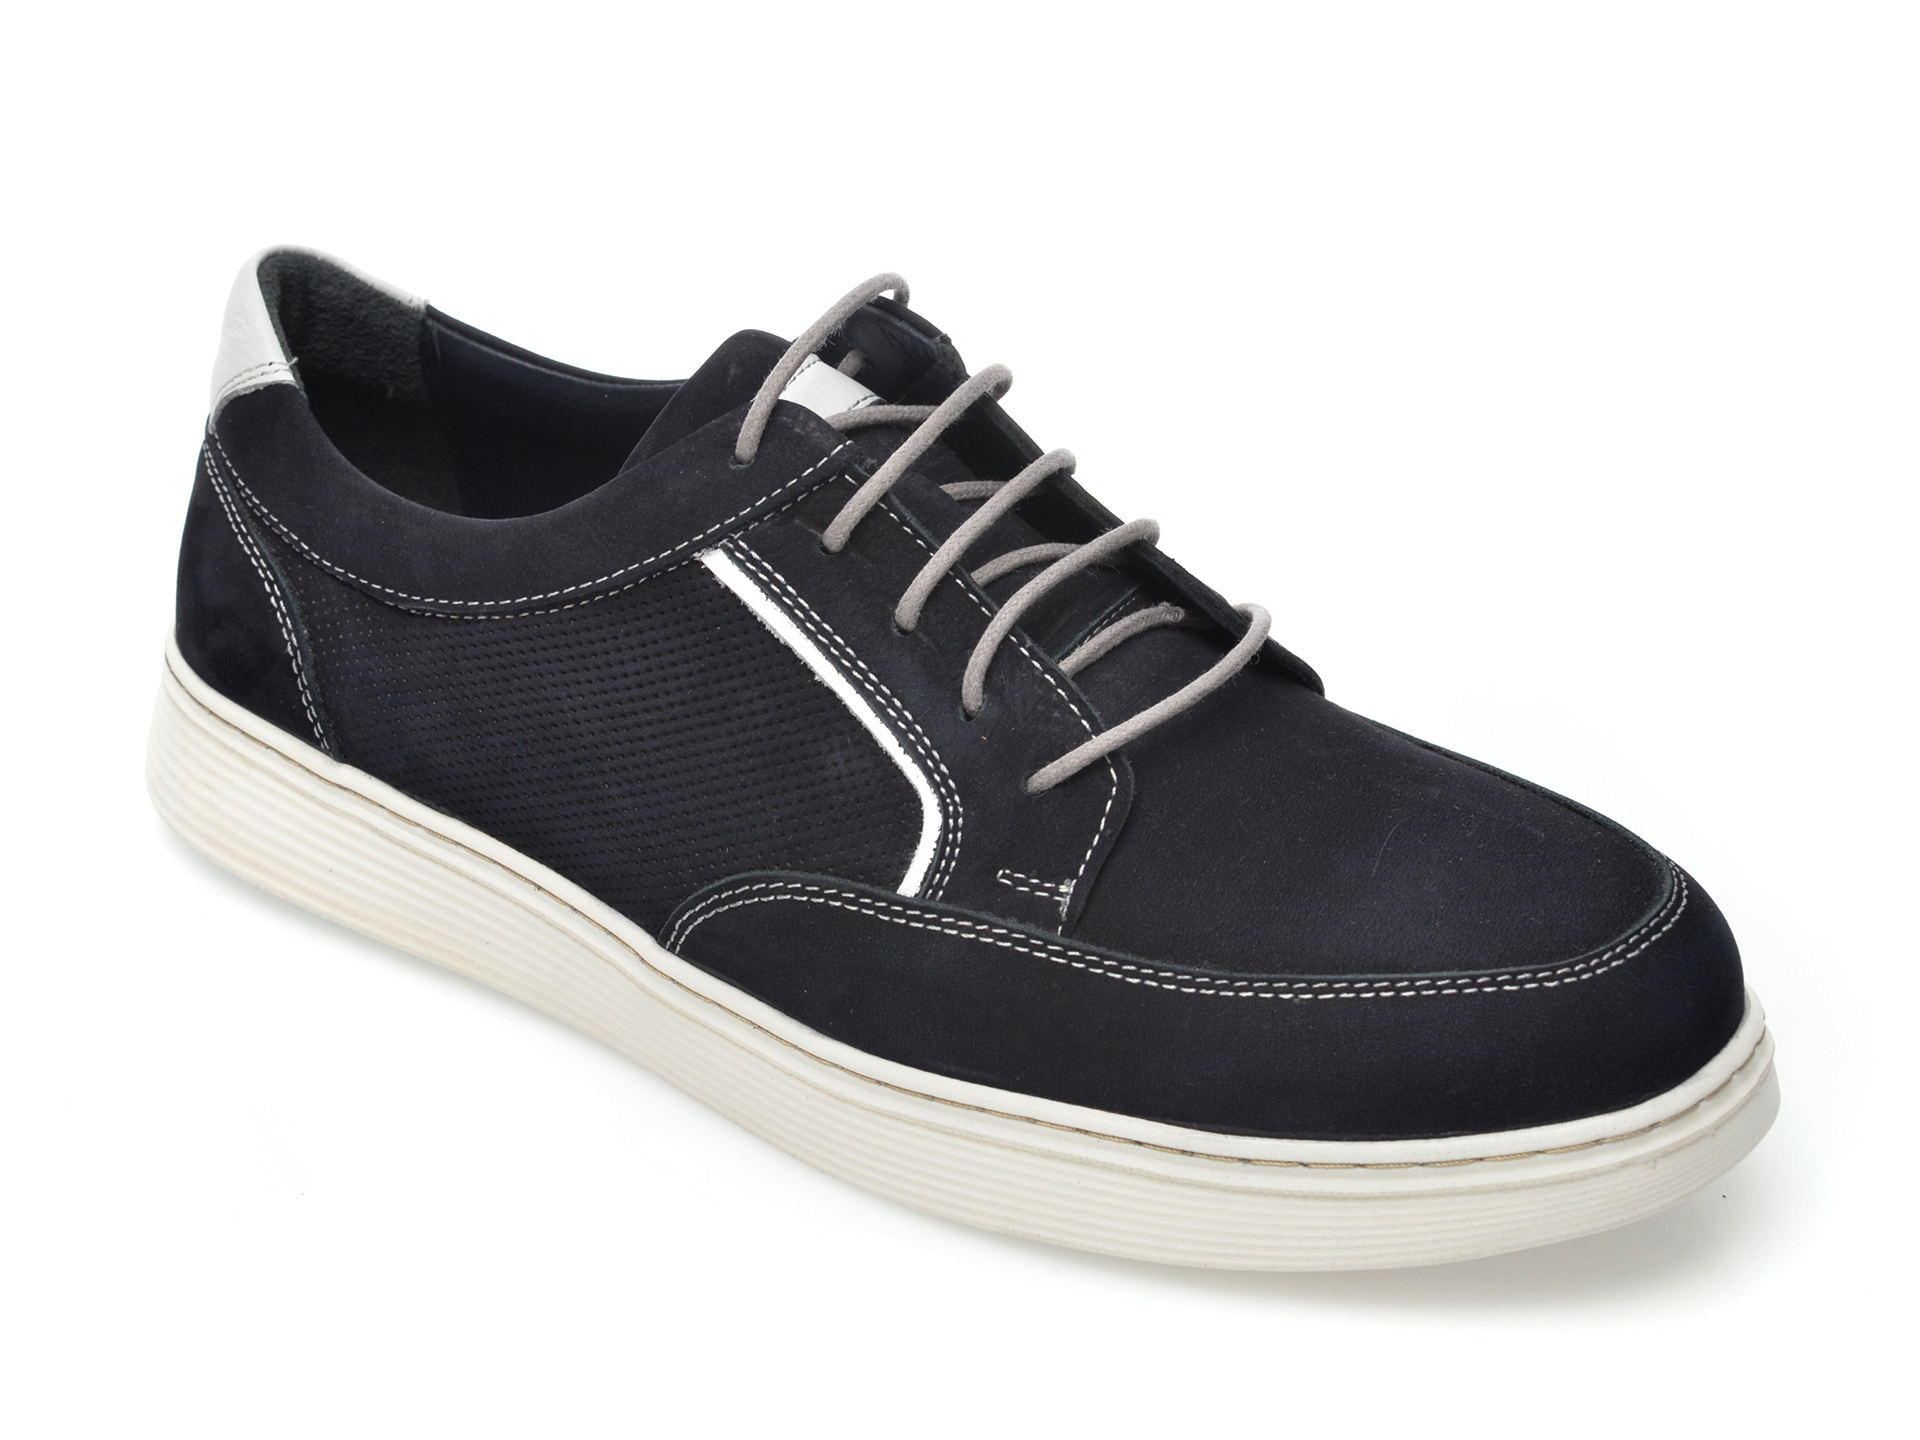 Pantofi Otter Bleumarin, 204108, Din Nabuc